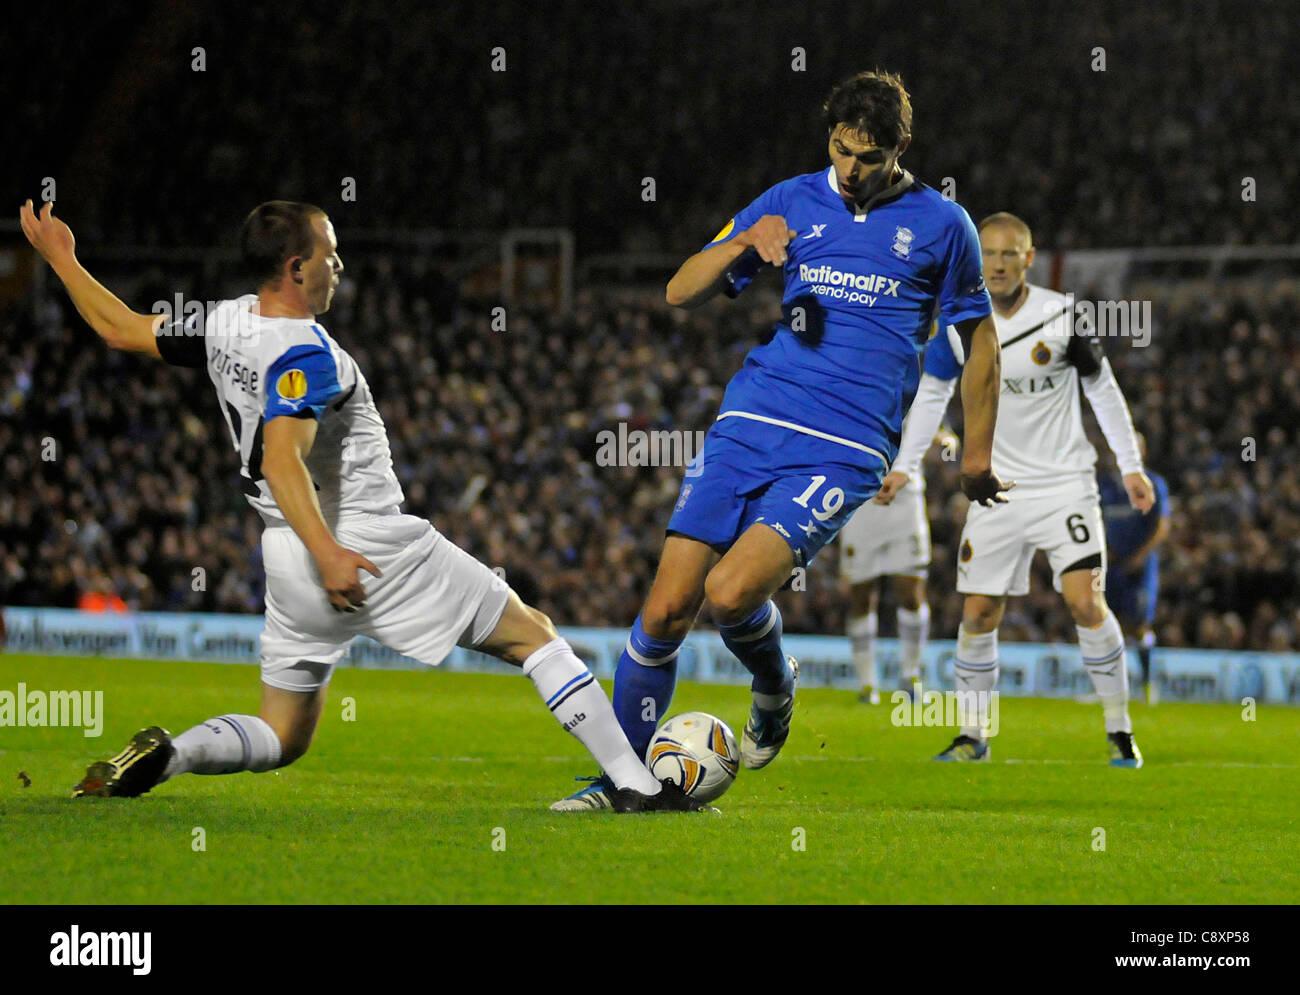 Birmingham City No.19 Nikola Zigic is tackled by Club Brugge No.24 Daan Van Gijseghem  Birmingham City v Club Brugge. Stock Photo